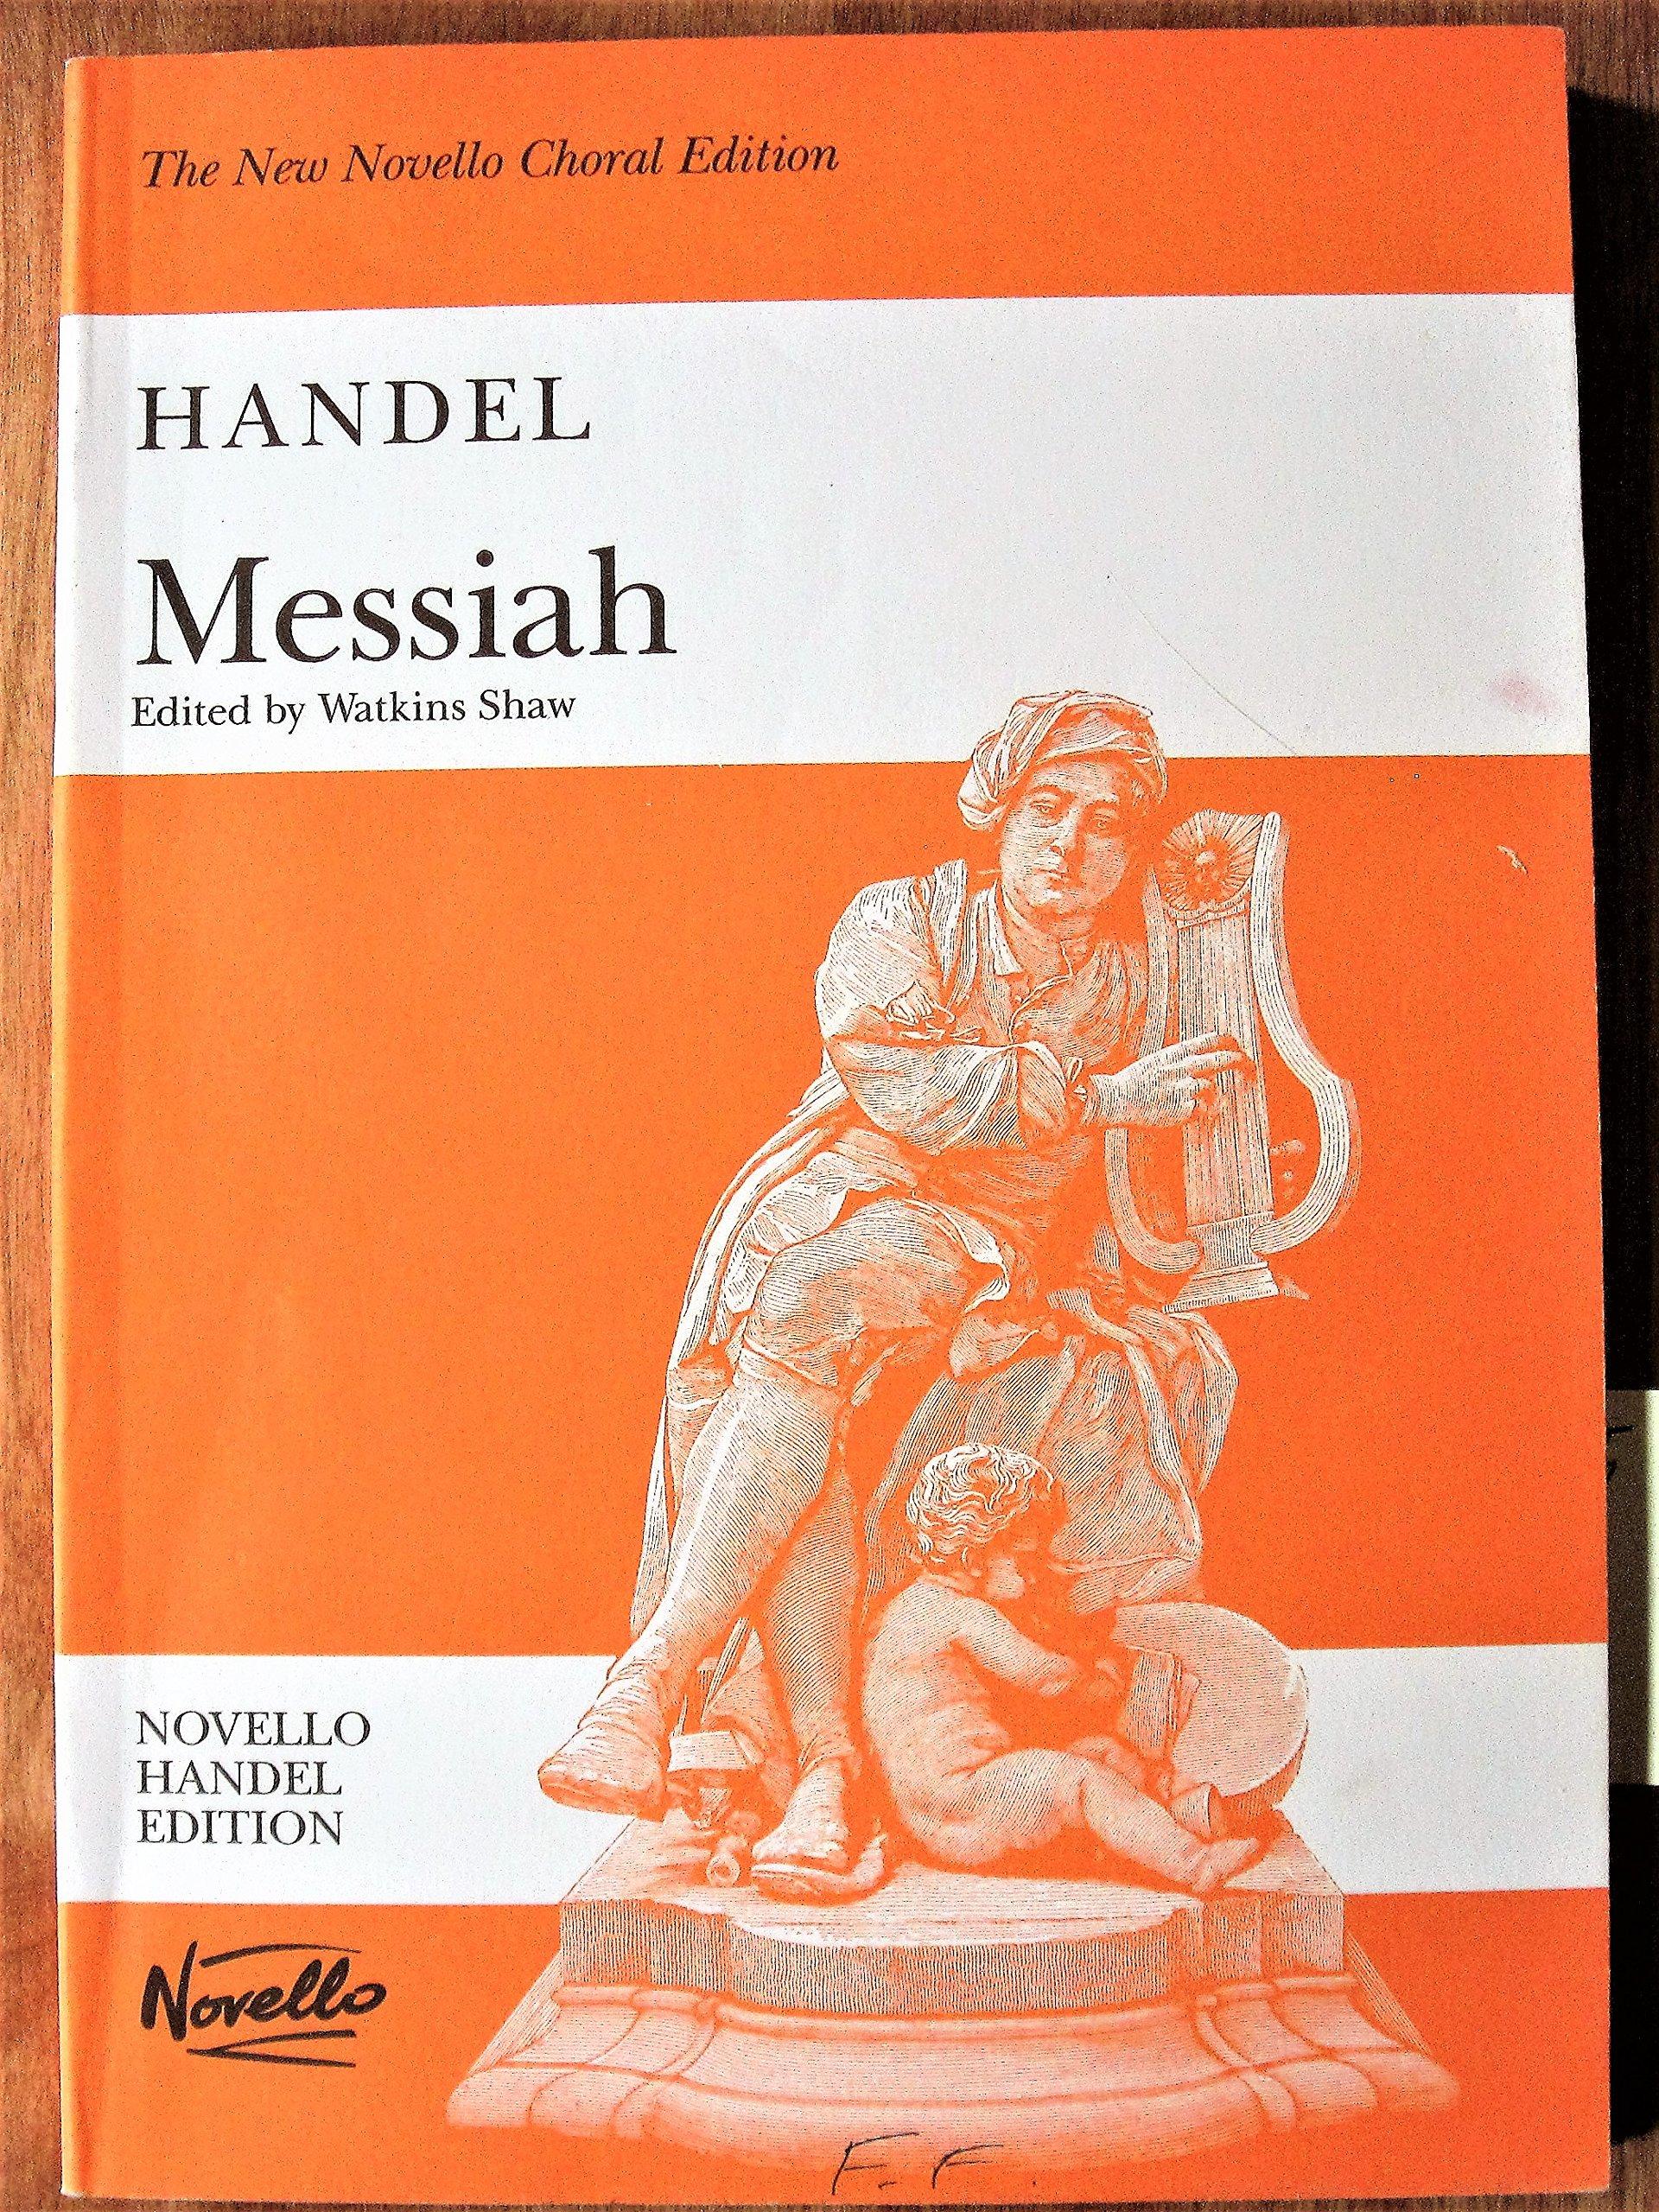 Handel: messiah the new novello choral edition promusica cork.